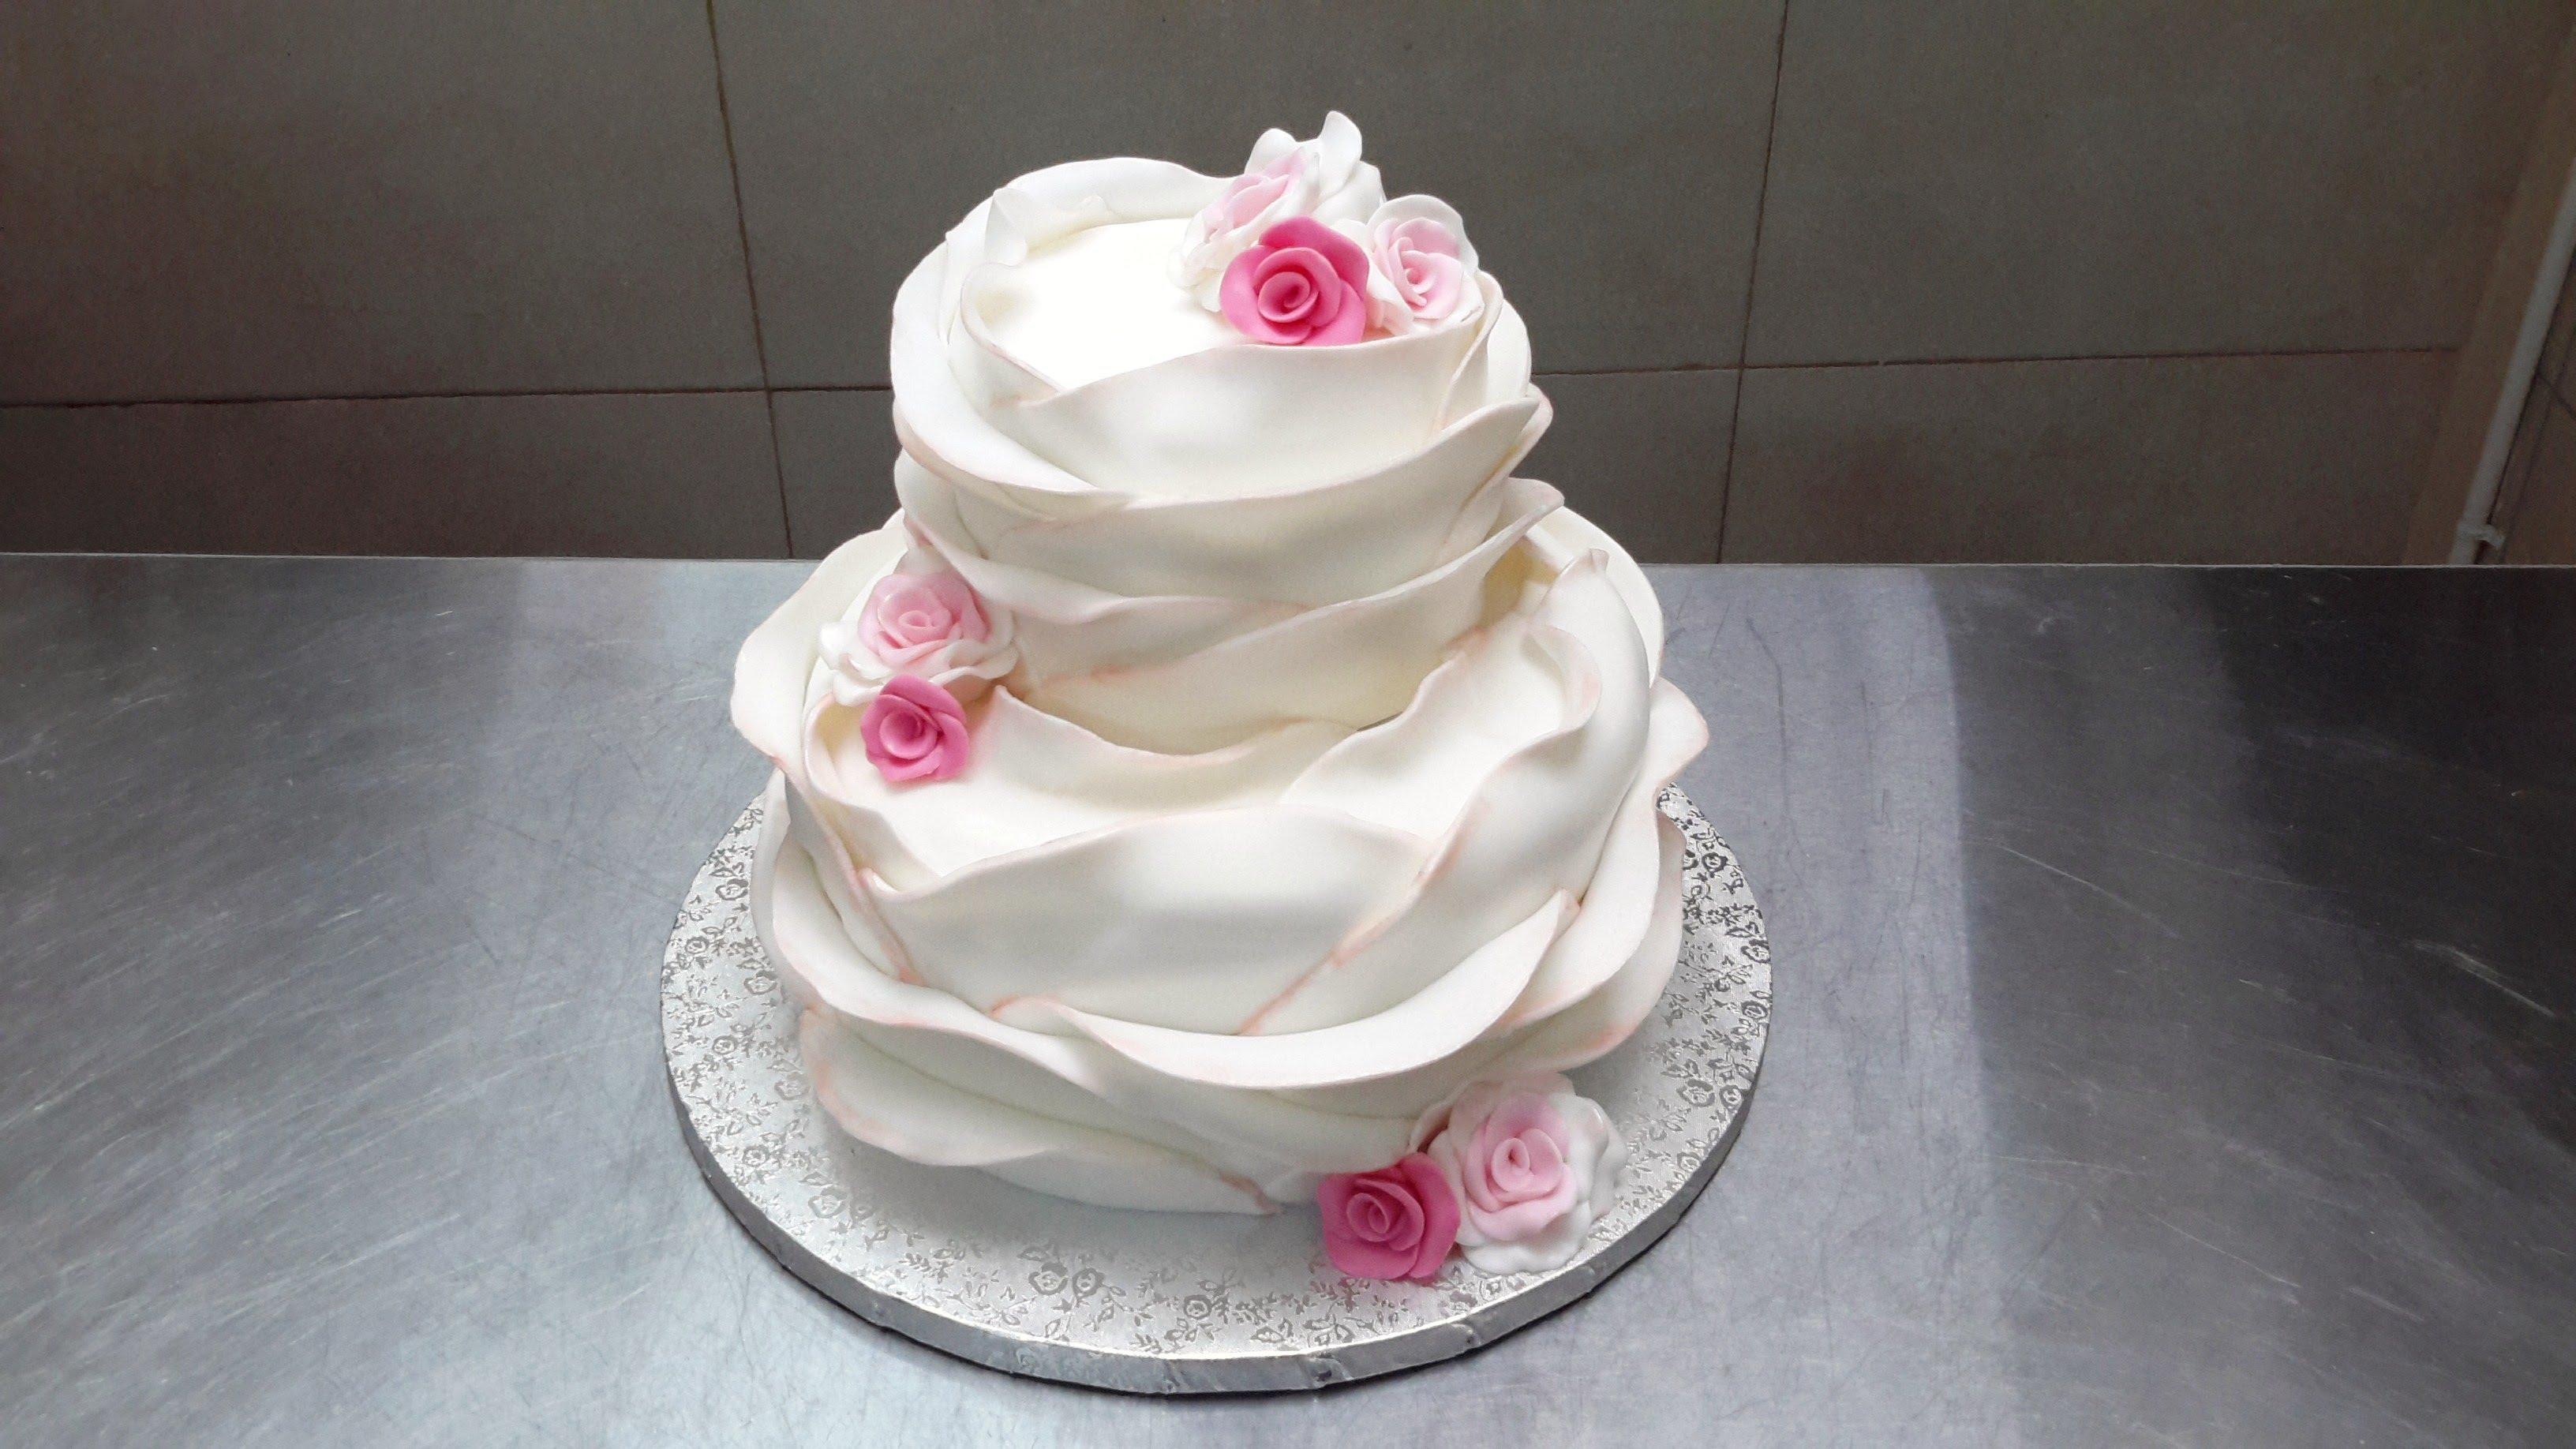 Making Roses Cake Decorating